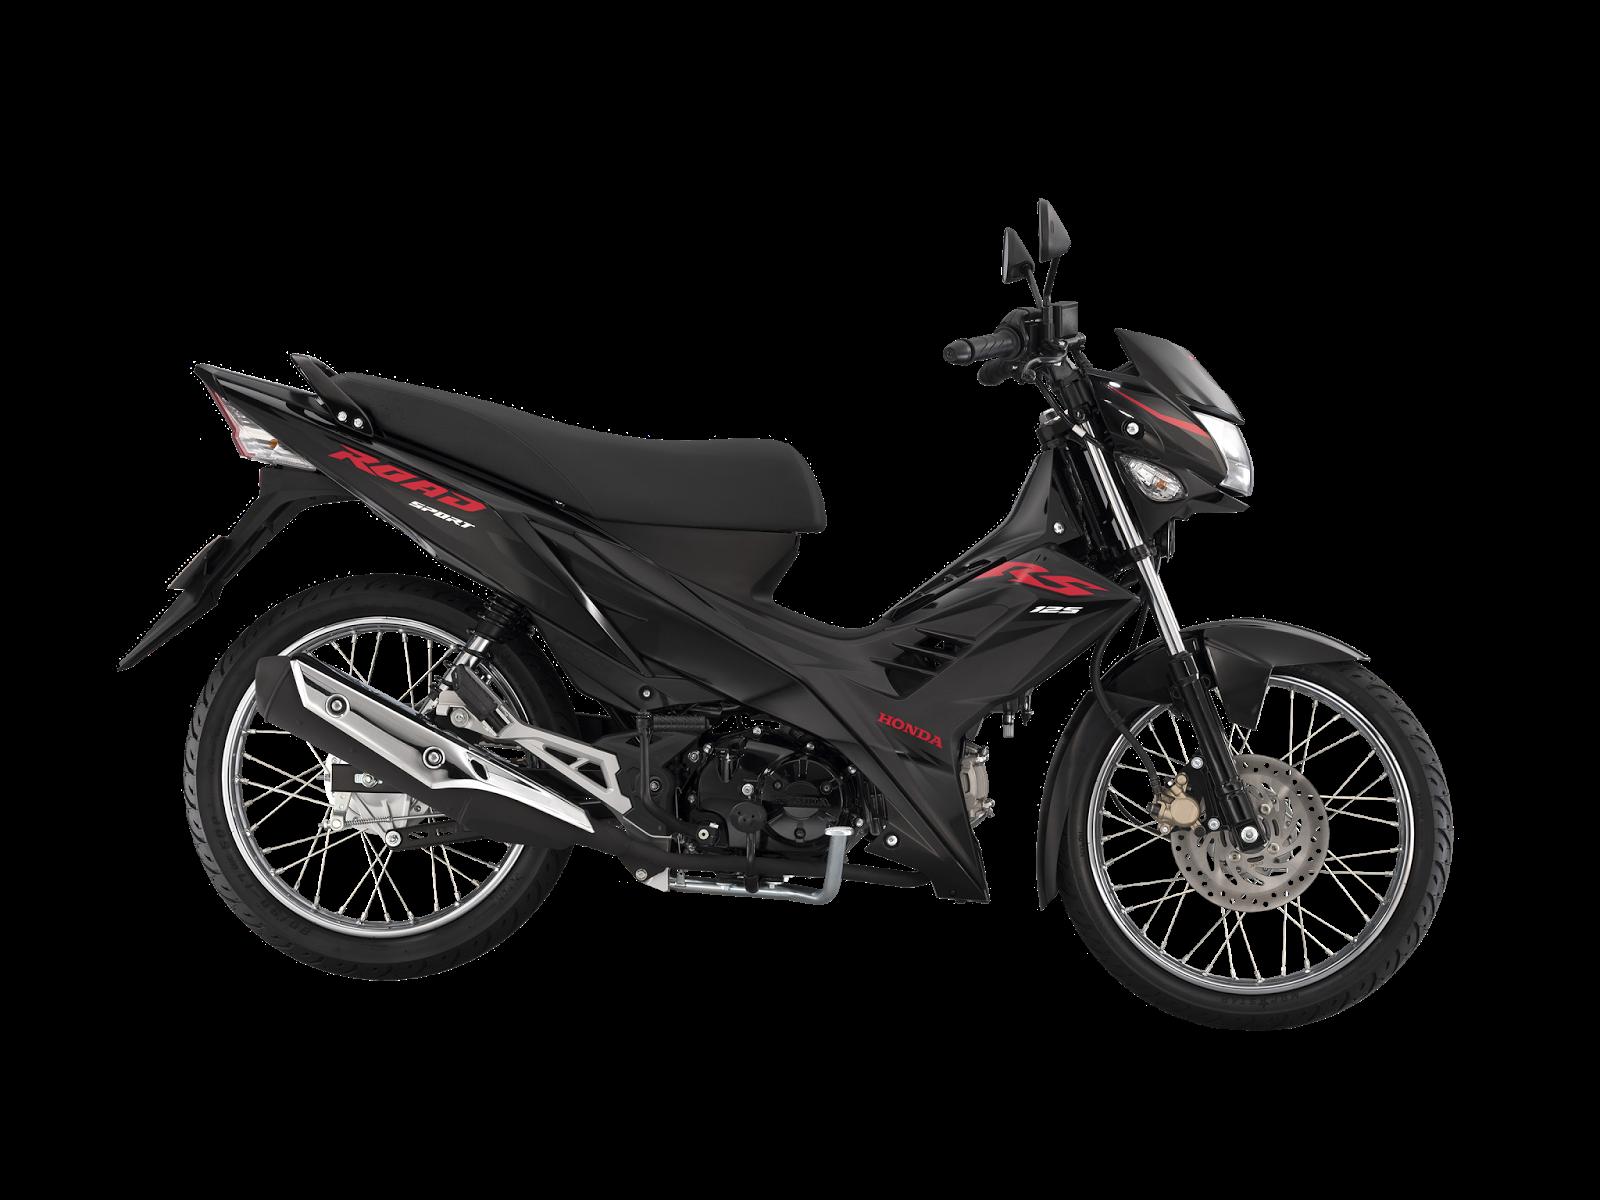 Xrm Motor Parts 100 Honda R150 Price Palex Motor Parts